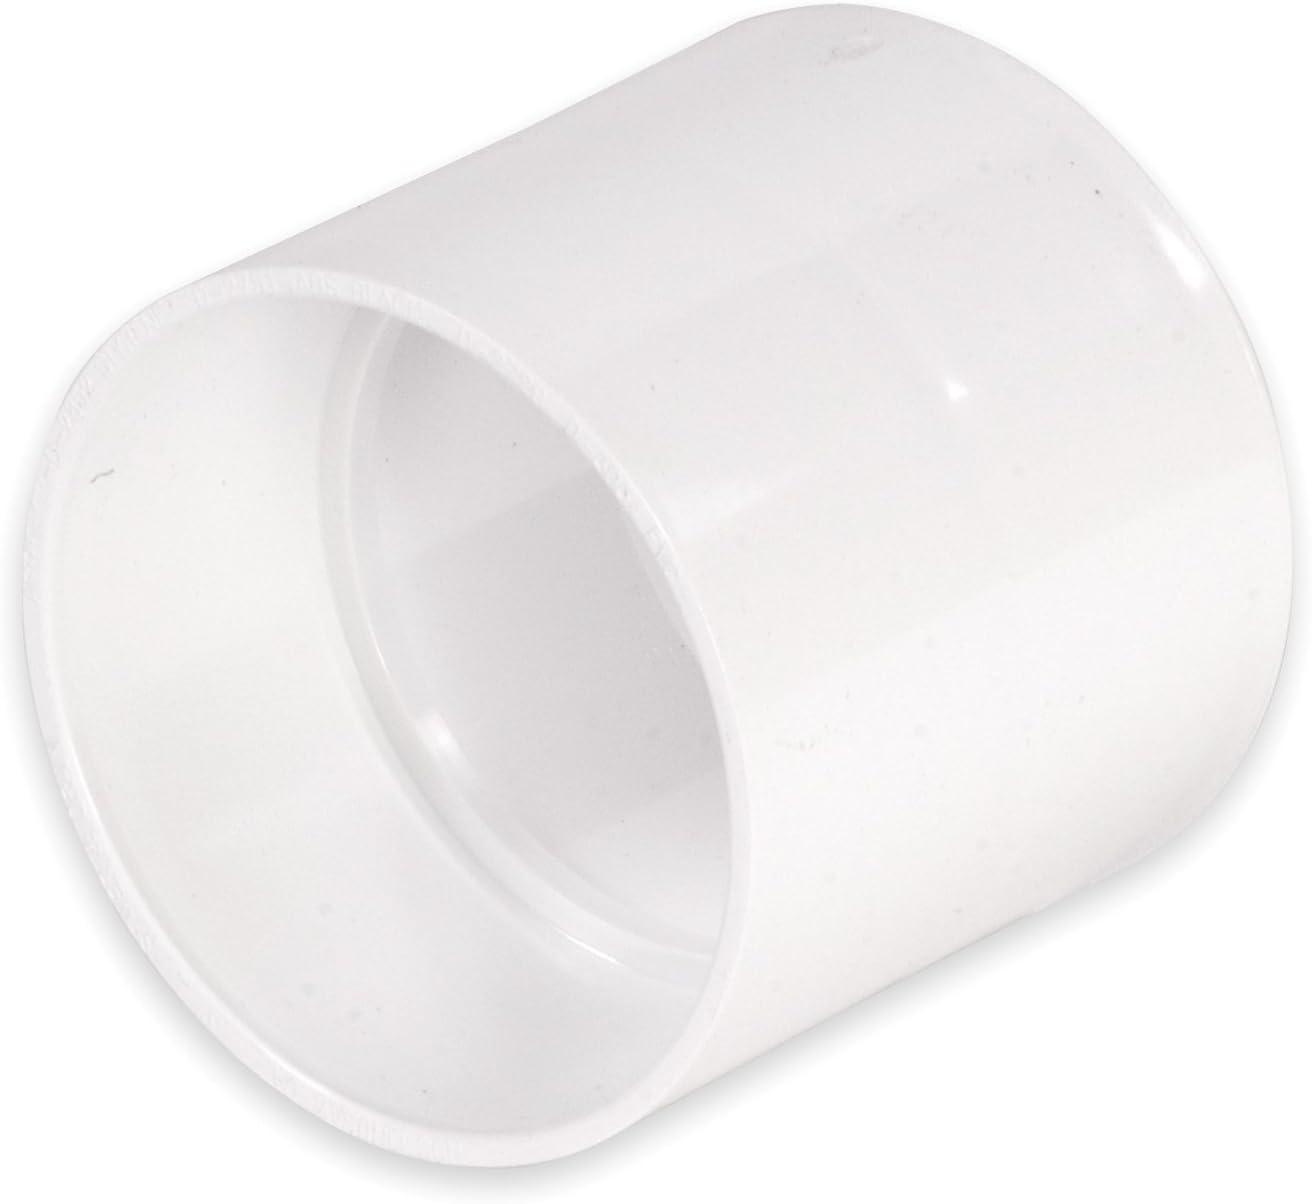 NDS 305 Styrene Max 61% OFF Coupling Solvent 3-Inch Weld Fitting Alternative dealer White